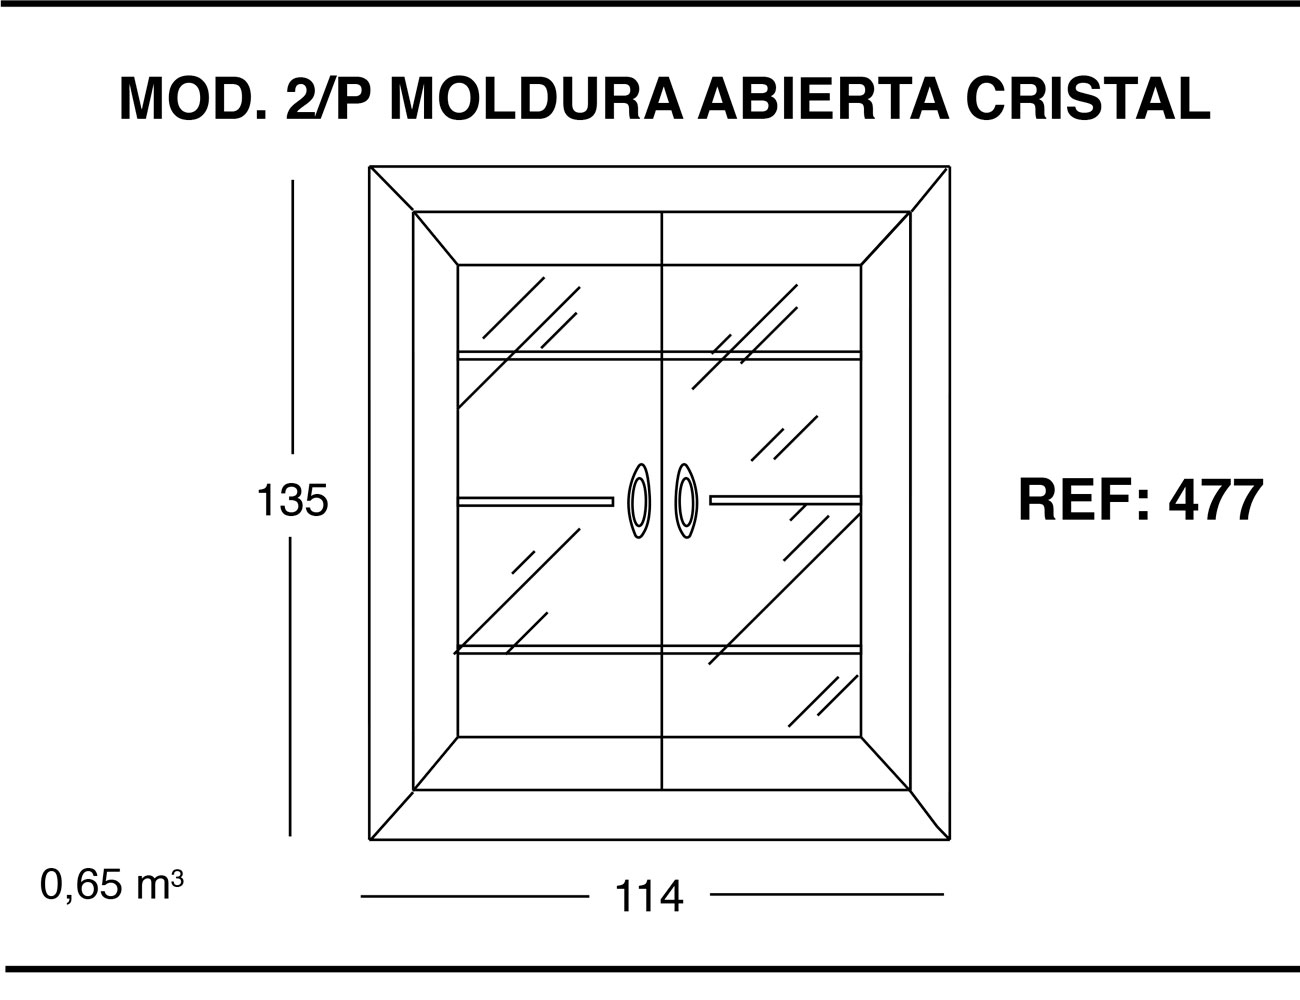 Modulo 2 puertas moldura abierta cristal